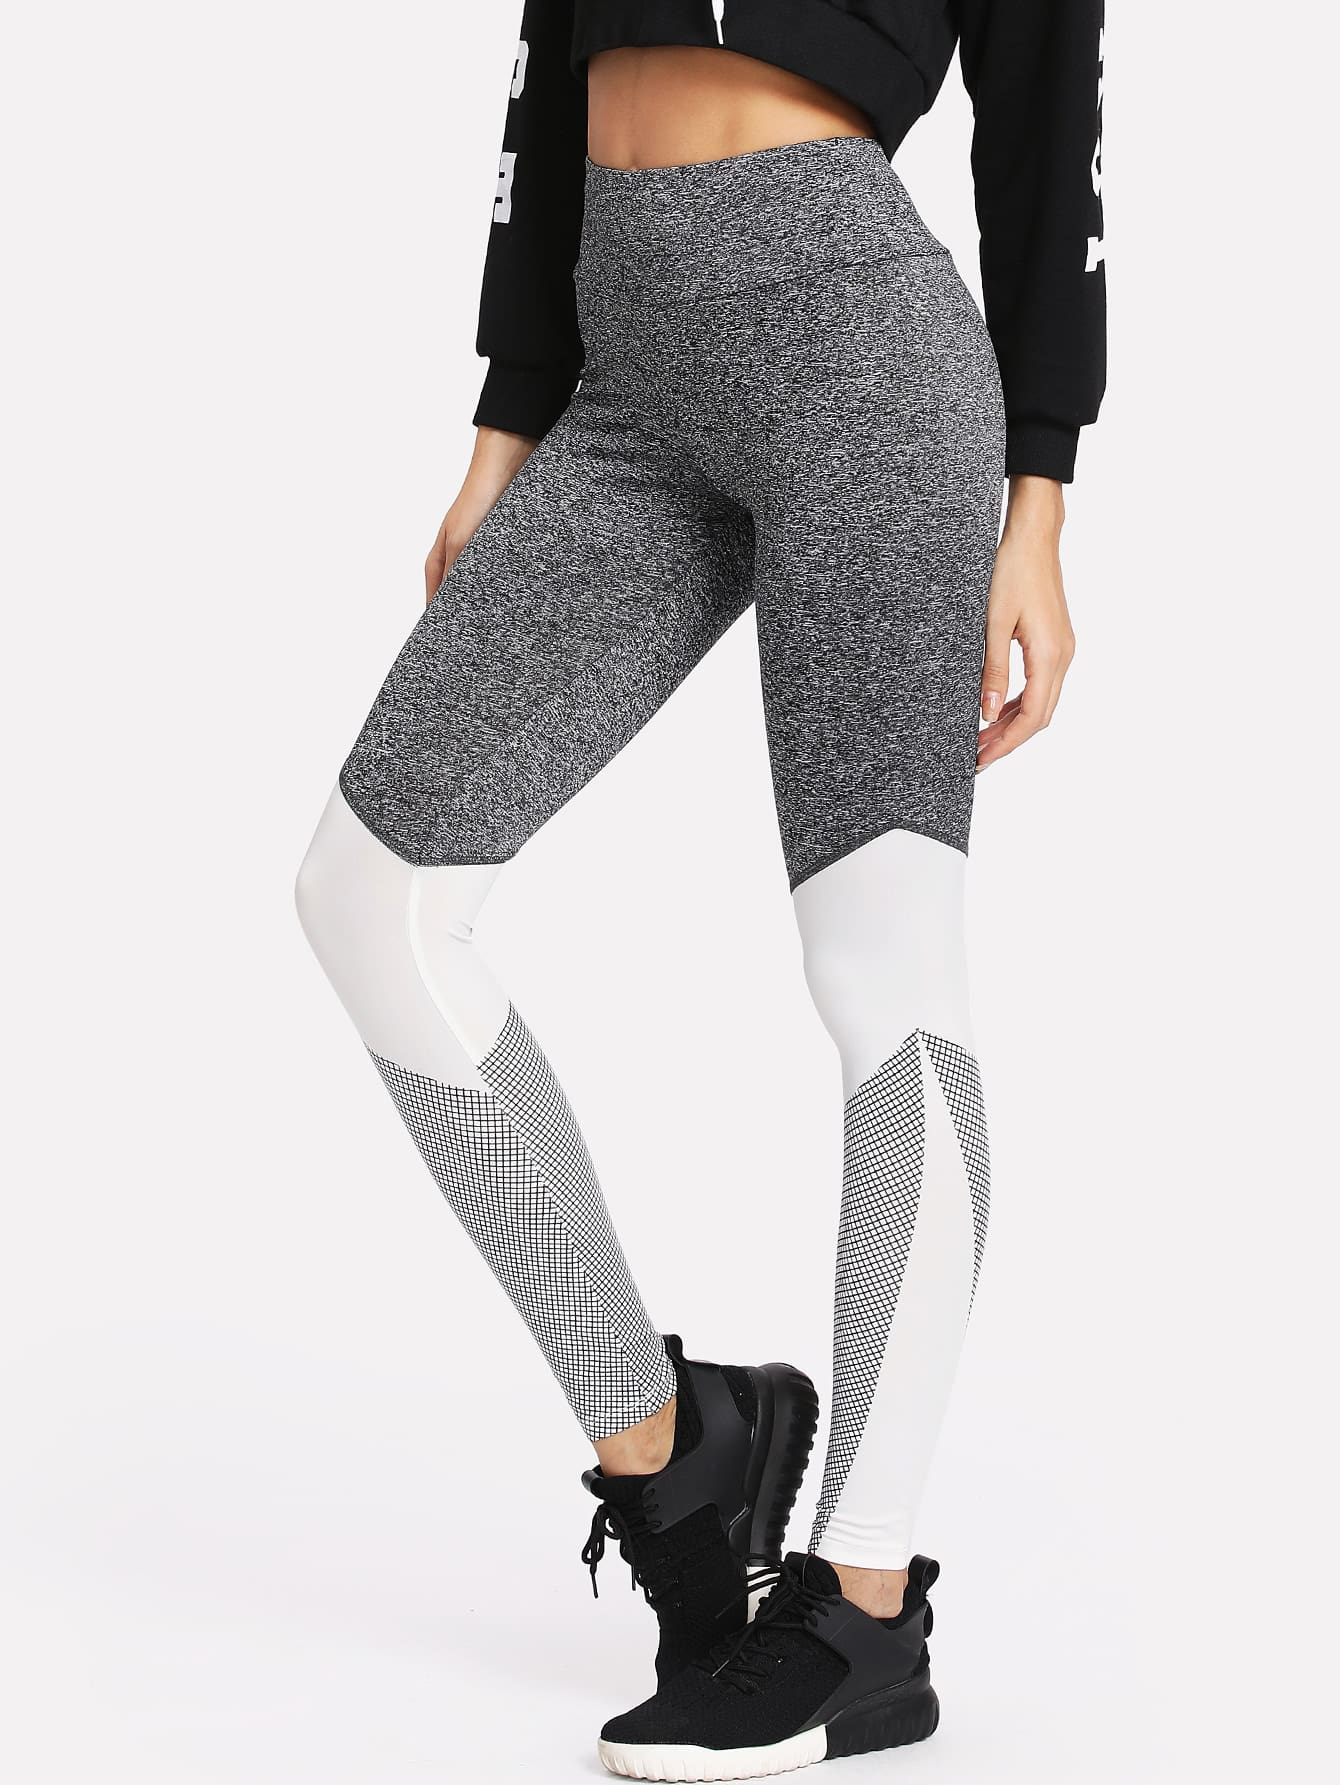 Wide Waistband Cut And Sew Leggings knit wide waistband leggings